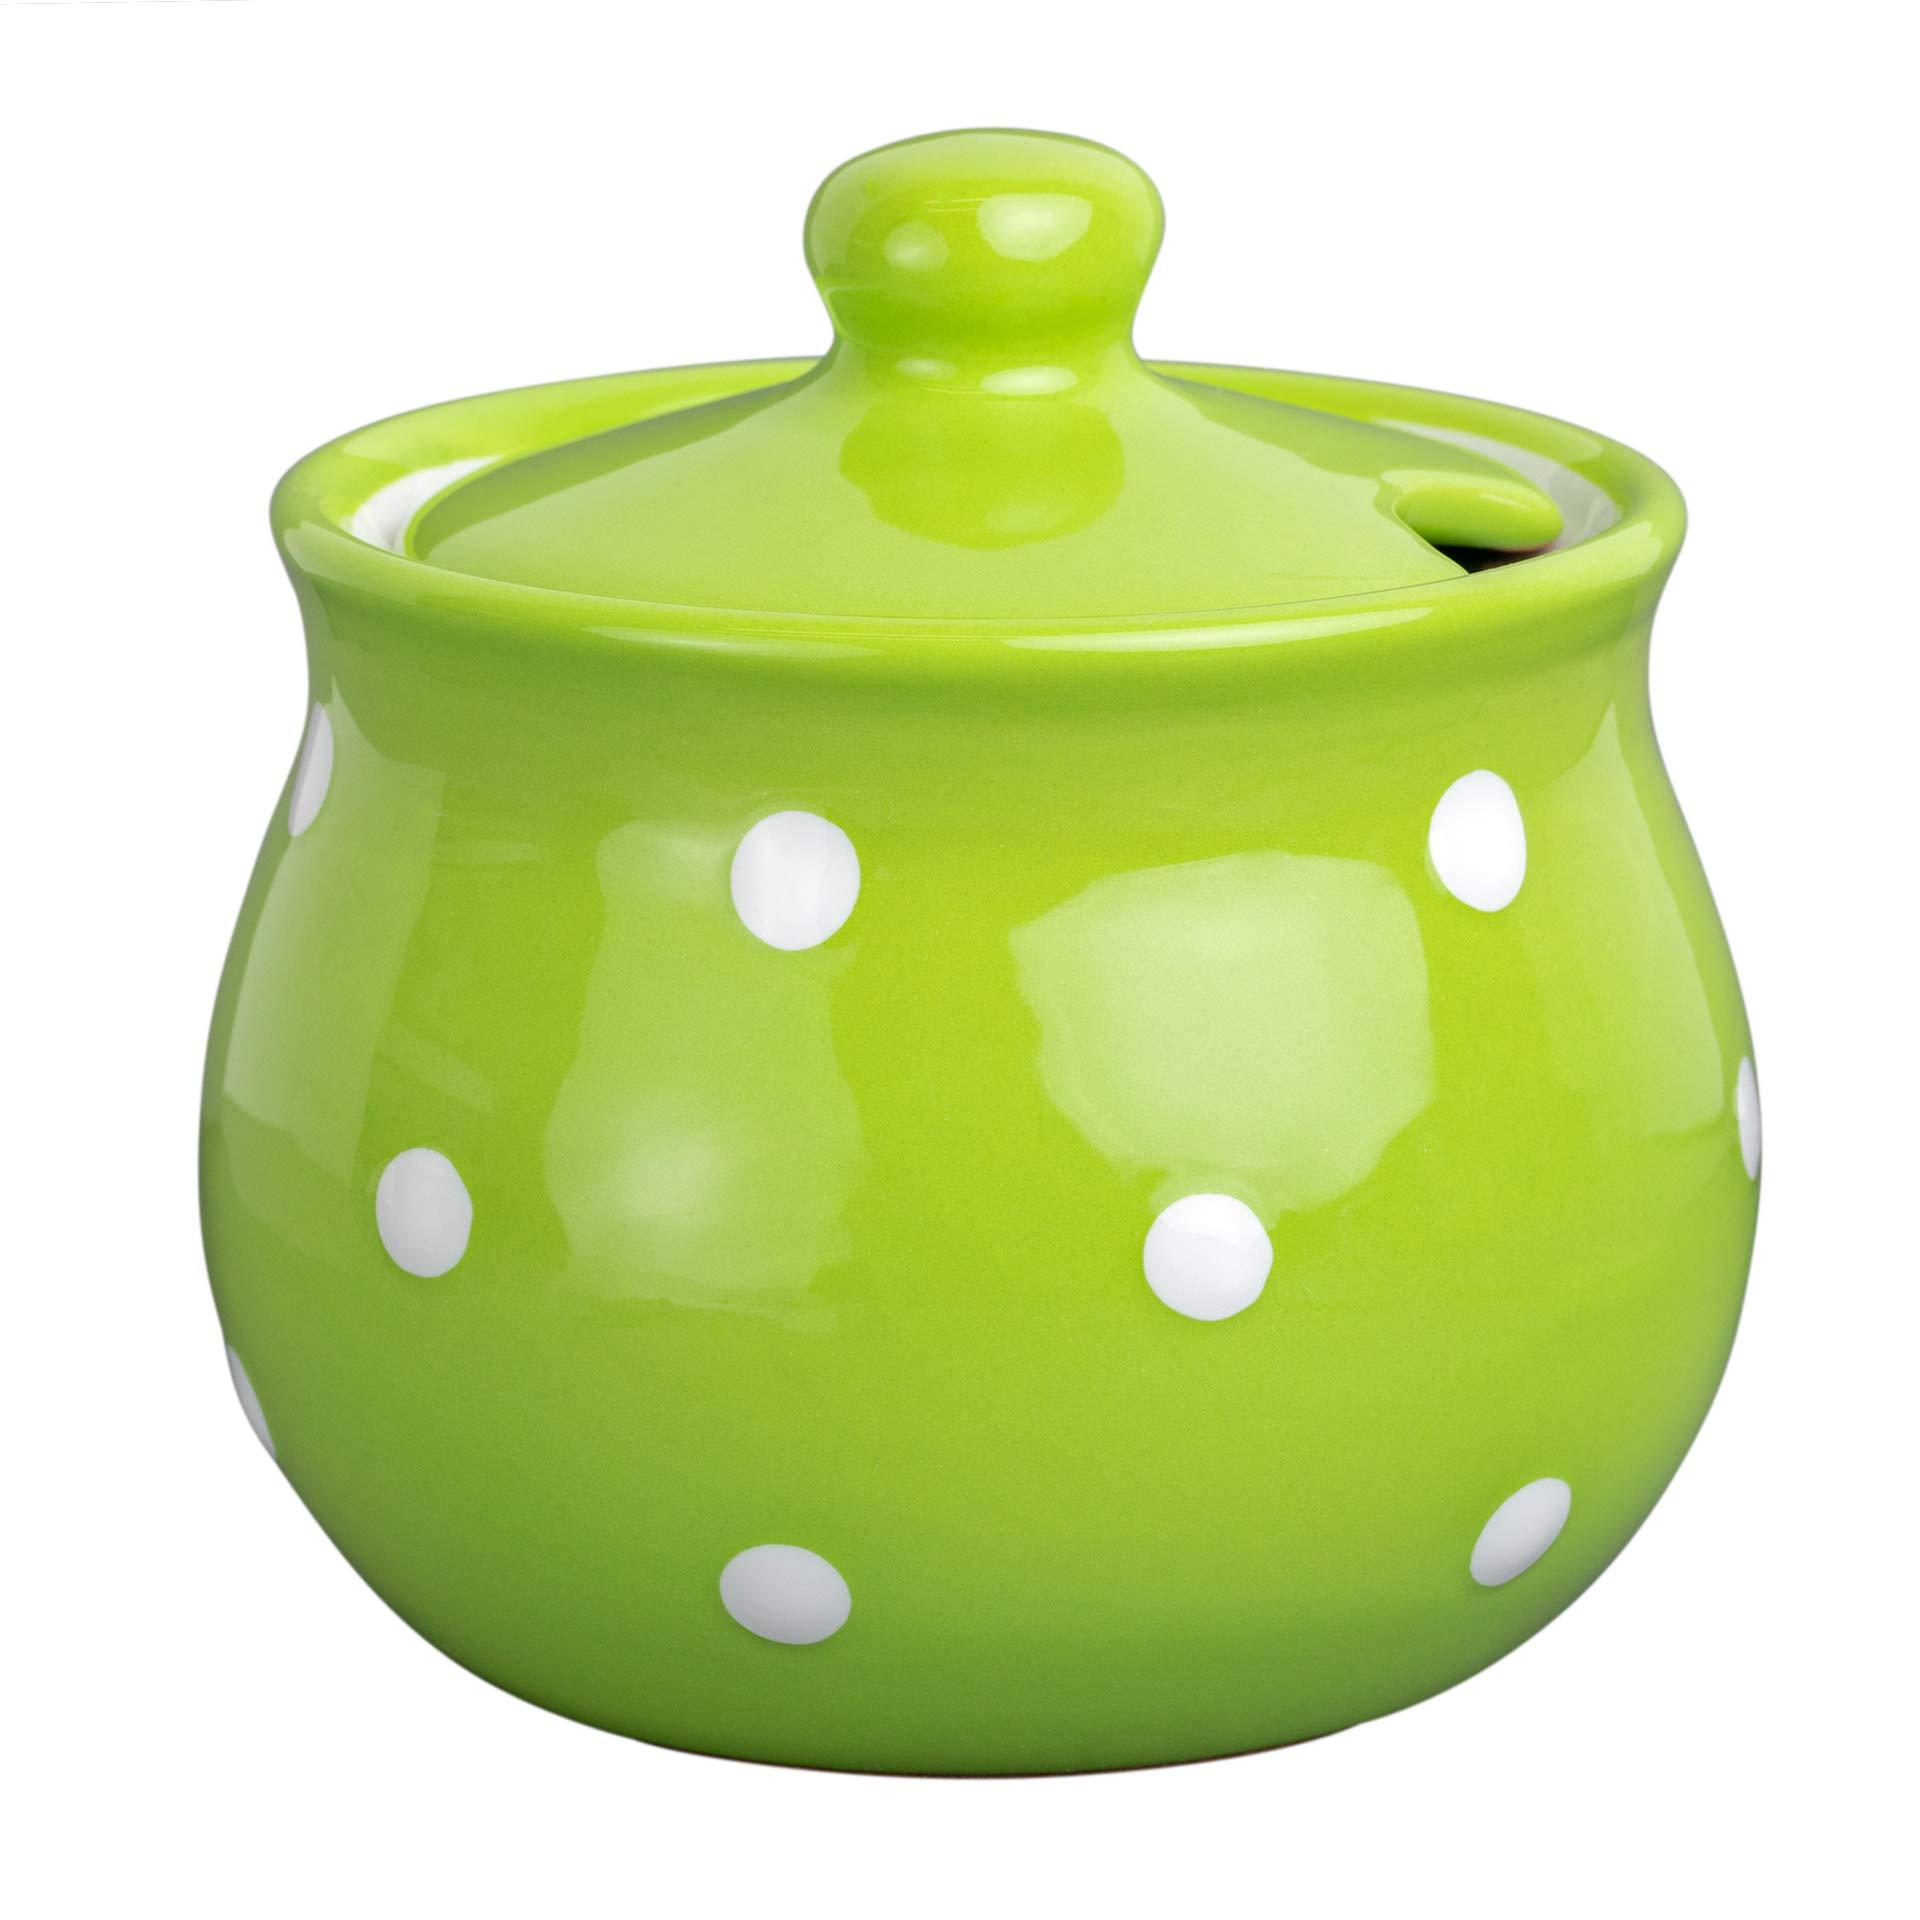 City to Cottage Handmade Lime Green and White Polka Dot Ceramic Sugar Bowl, Pot with Lid   Pottery Honey Jar, Jam Jar   Housewarming Gift